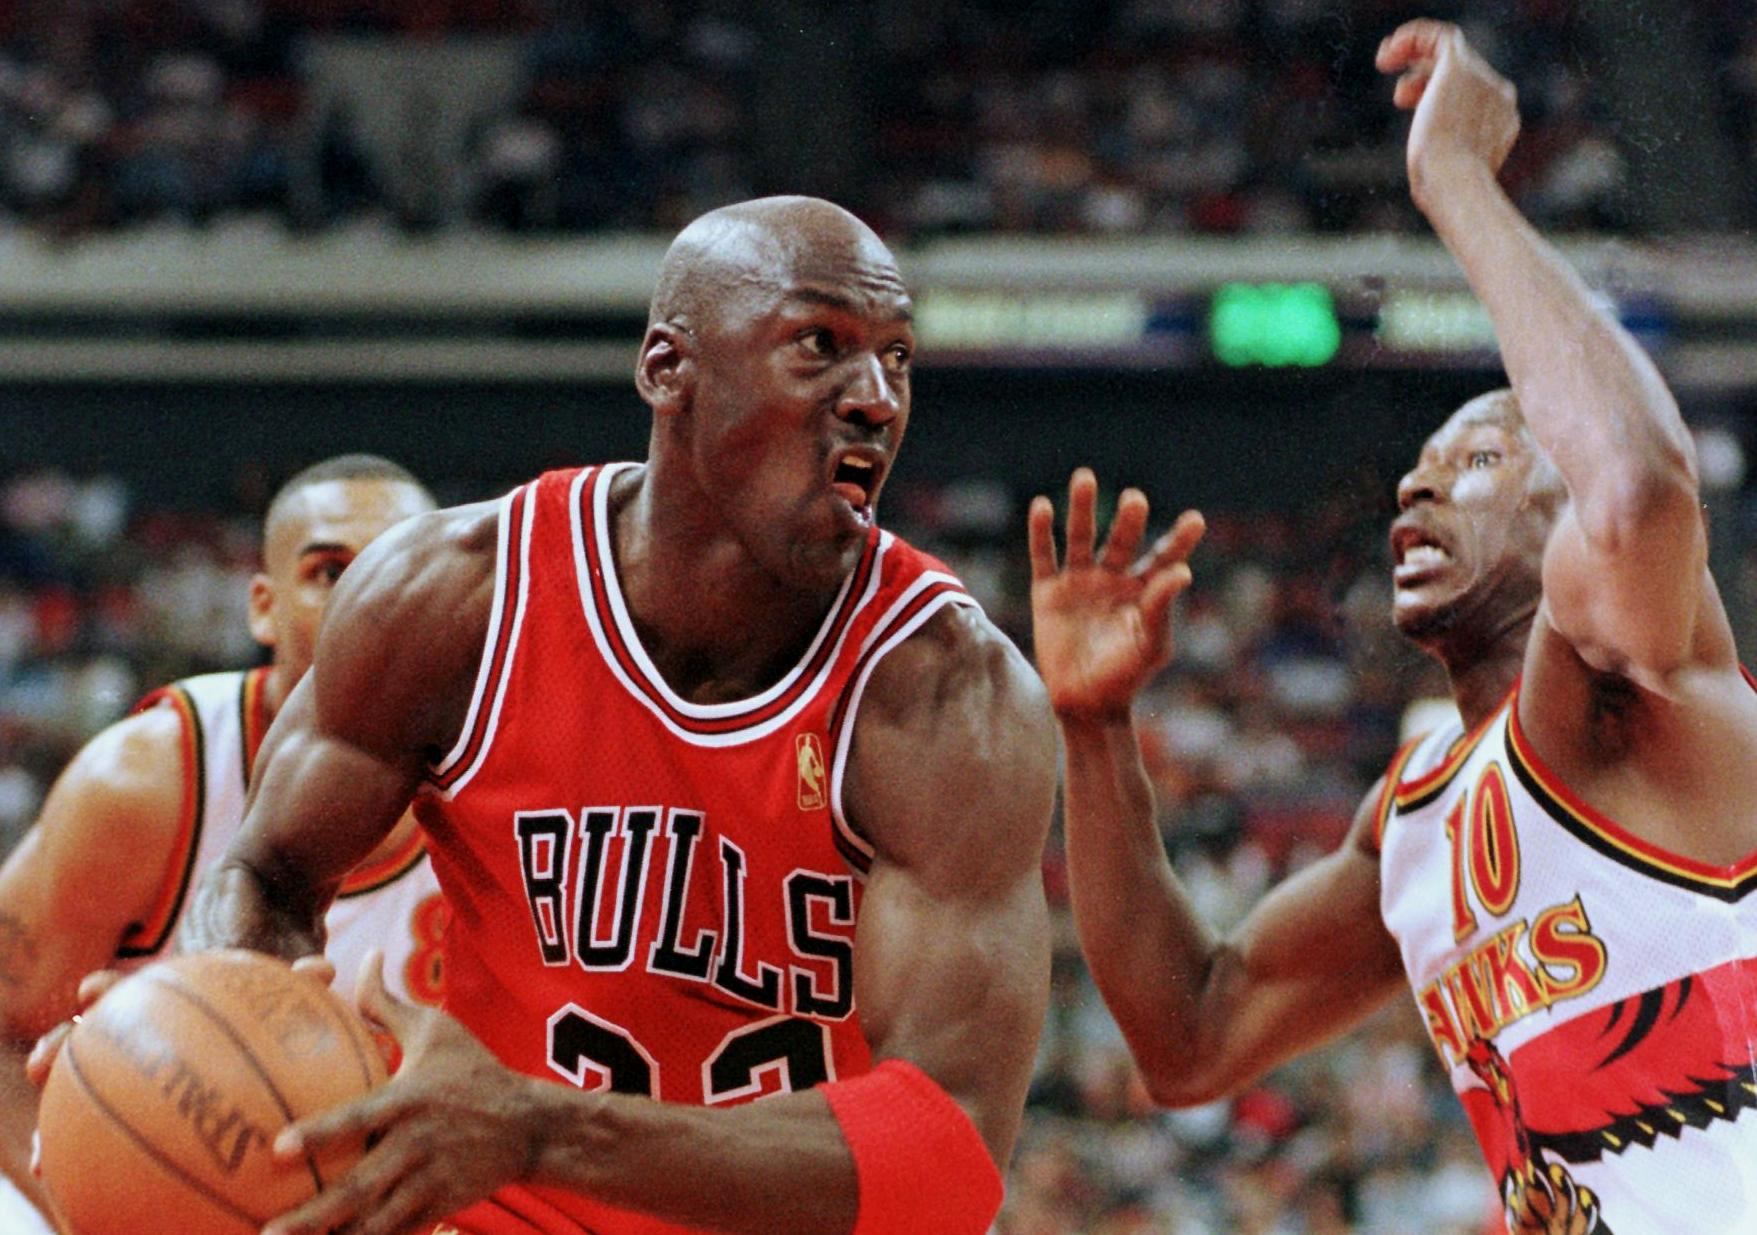 a history of the basketball player michael jordan